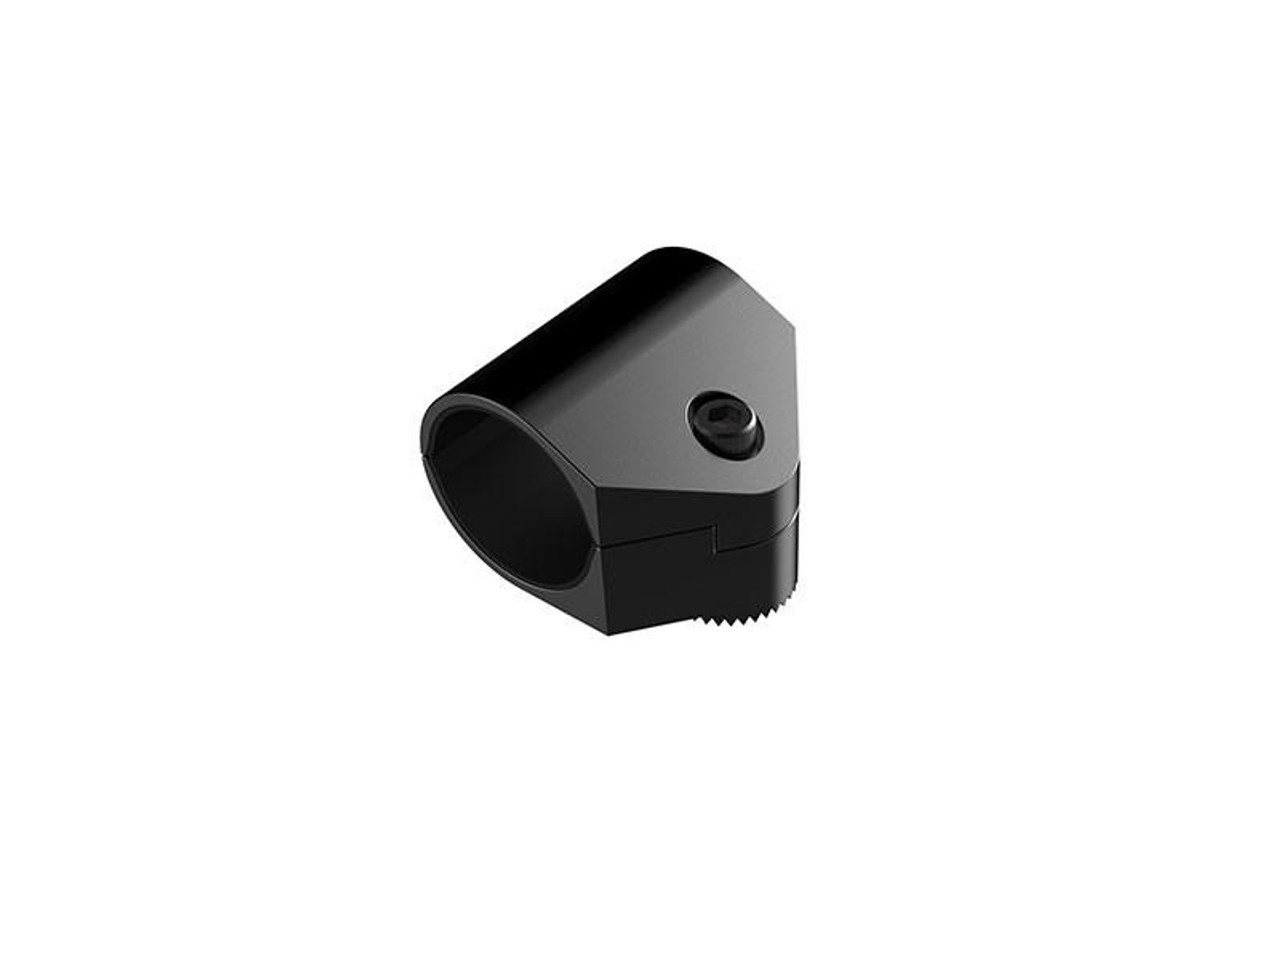 Billet aluminum Replay XD Camera Clamp